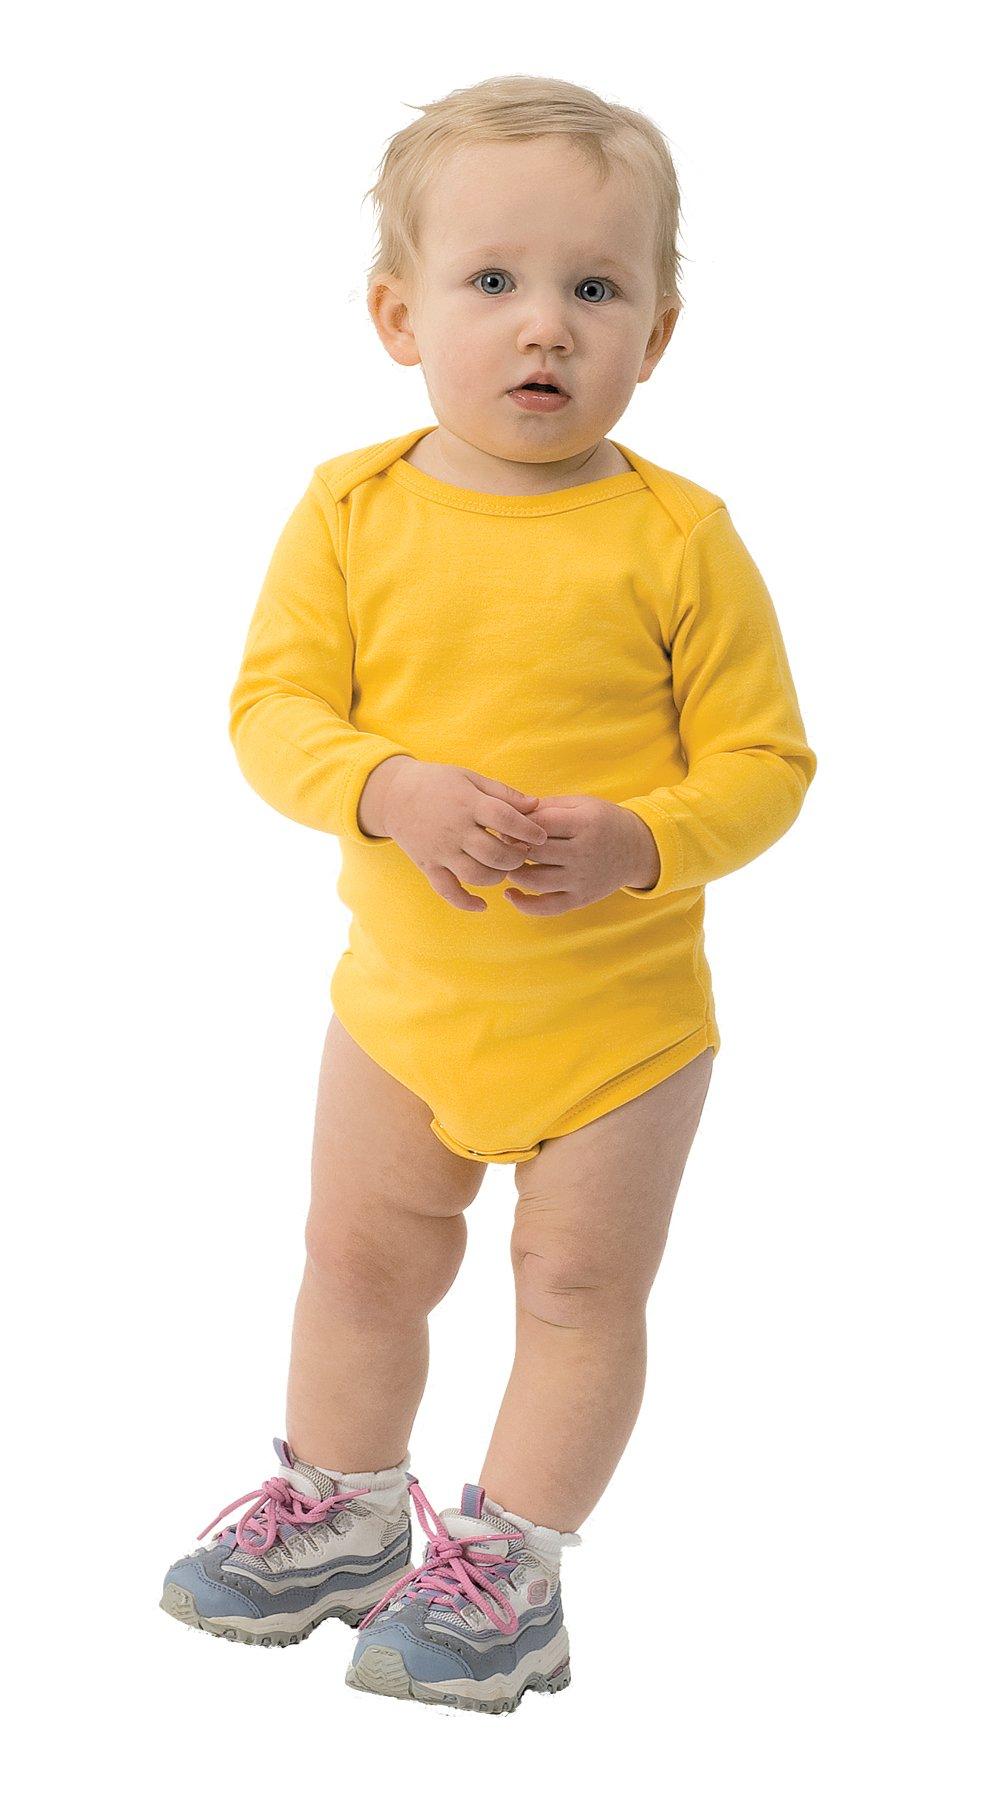 Monag Yellow Long Sleeve Bodysuit 6-12M Yellow by Monag (Image #1)